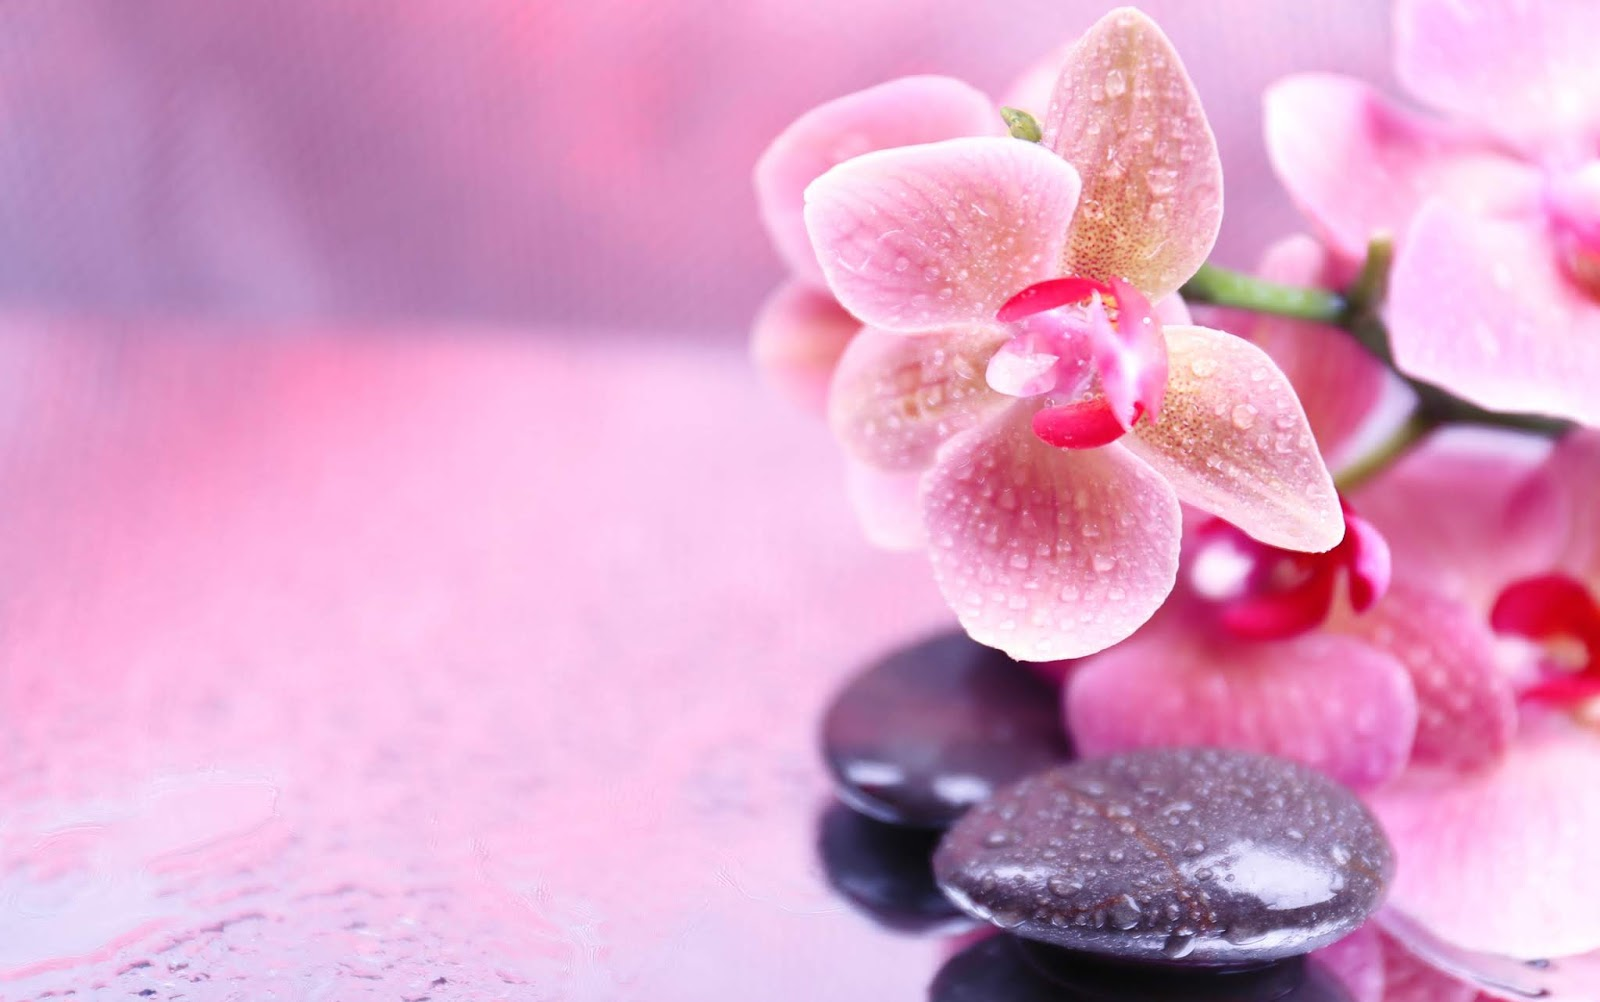 39+ Hình nền hoa phong lan đẹp Full HD cho desktop laptop